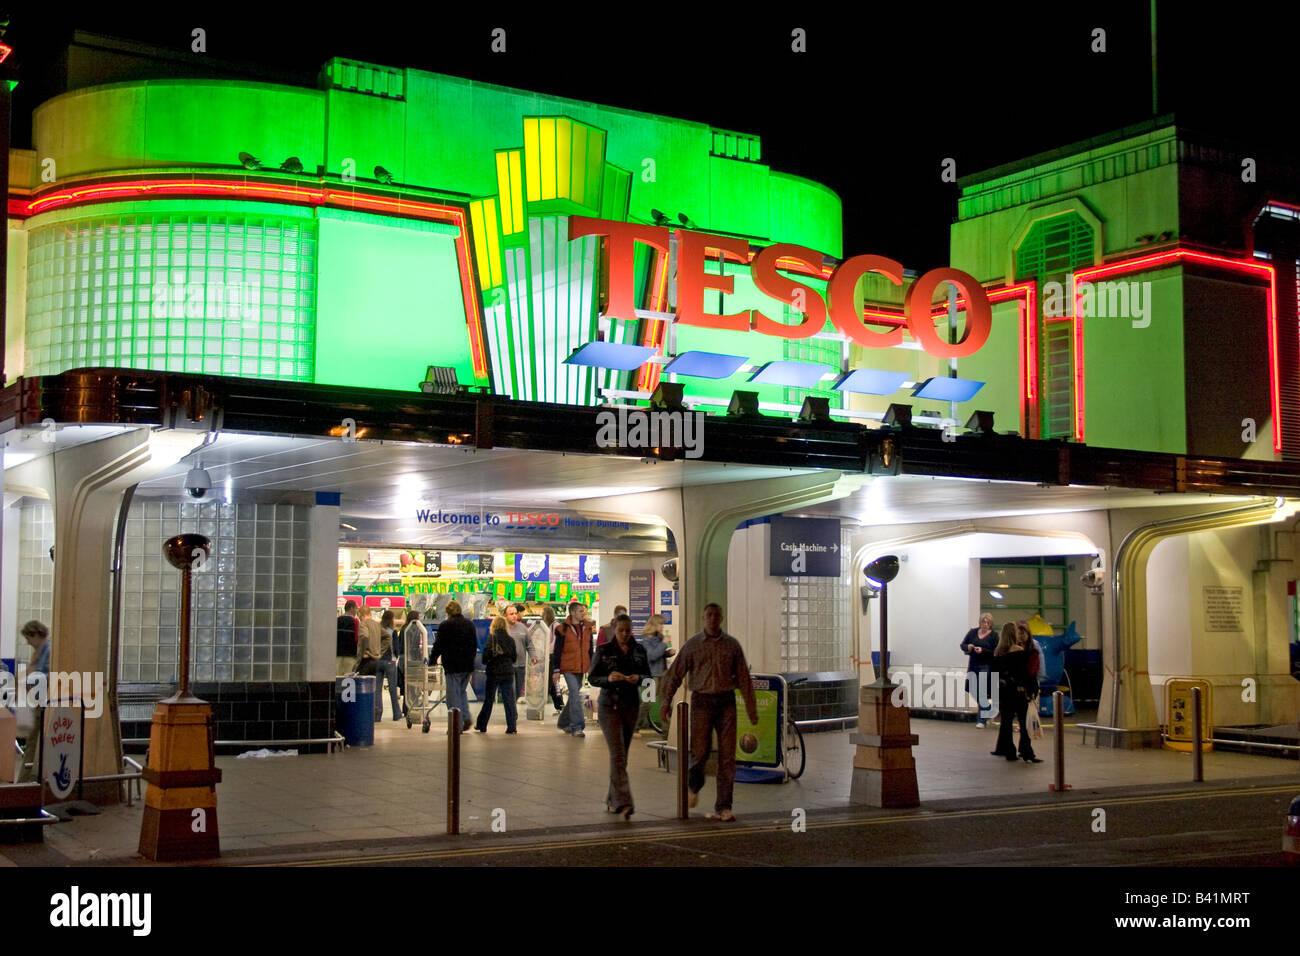 entrance-to-tesco-supermarket-in-former-